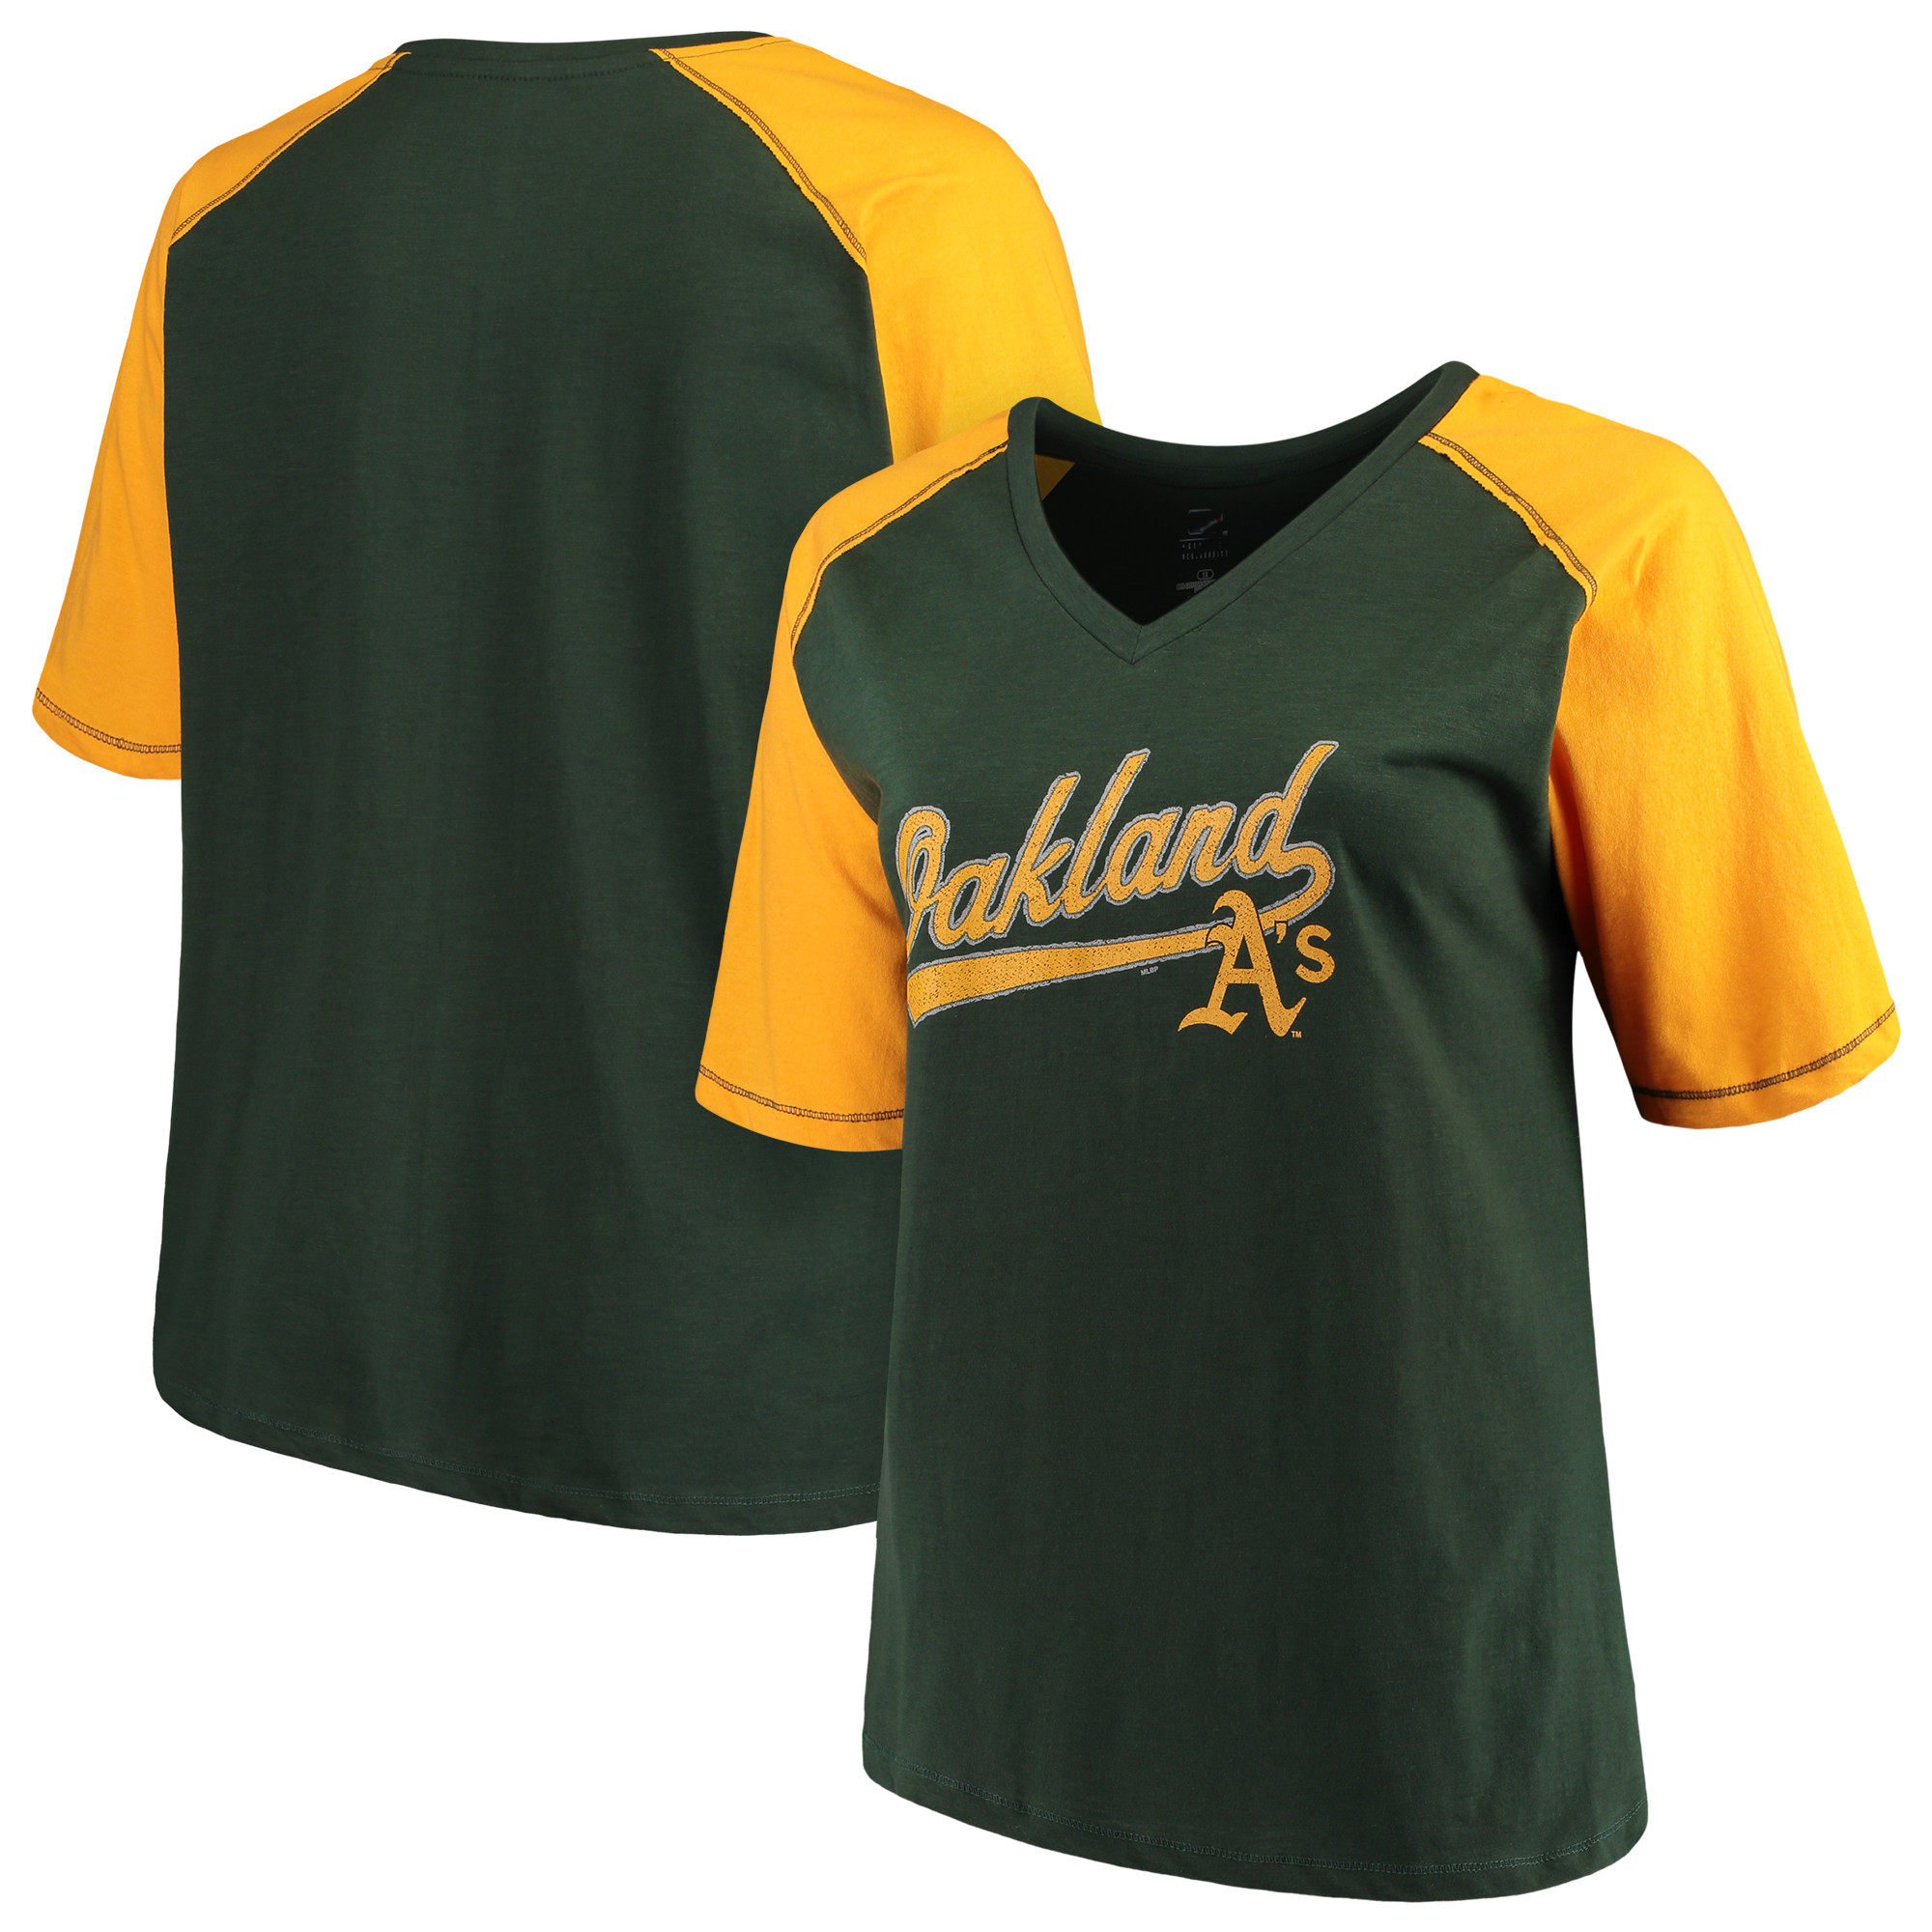 Women's Majestic Green/Gold Oakland Athletics Plus Size High Percentage Raglan V-Neck T-Shirt